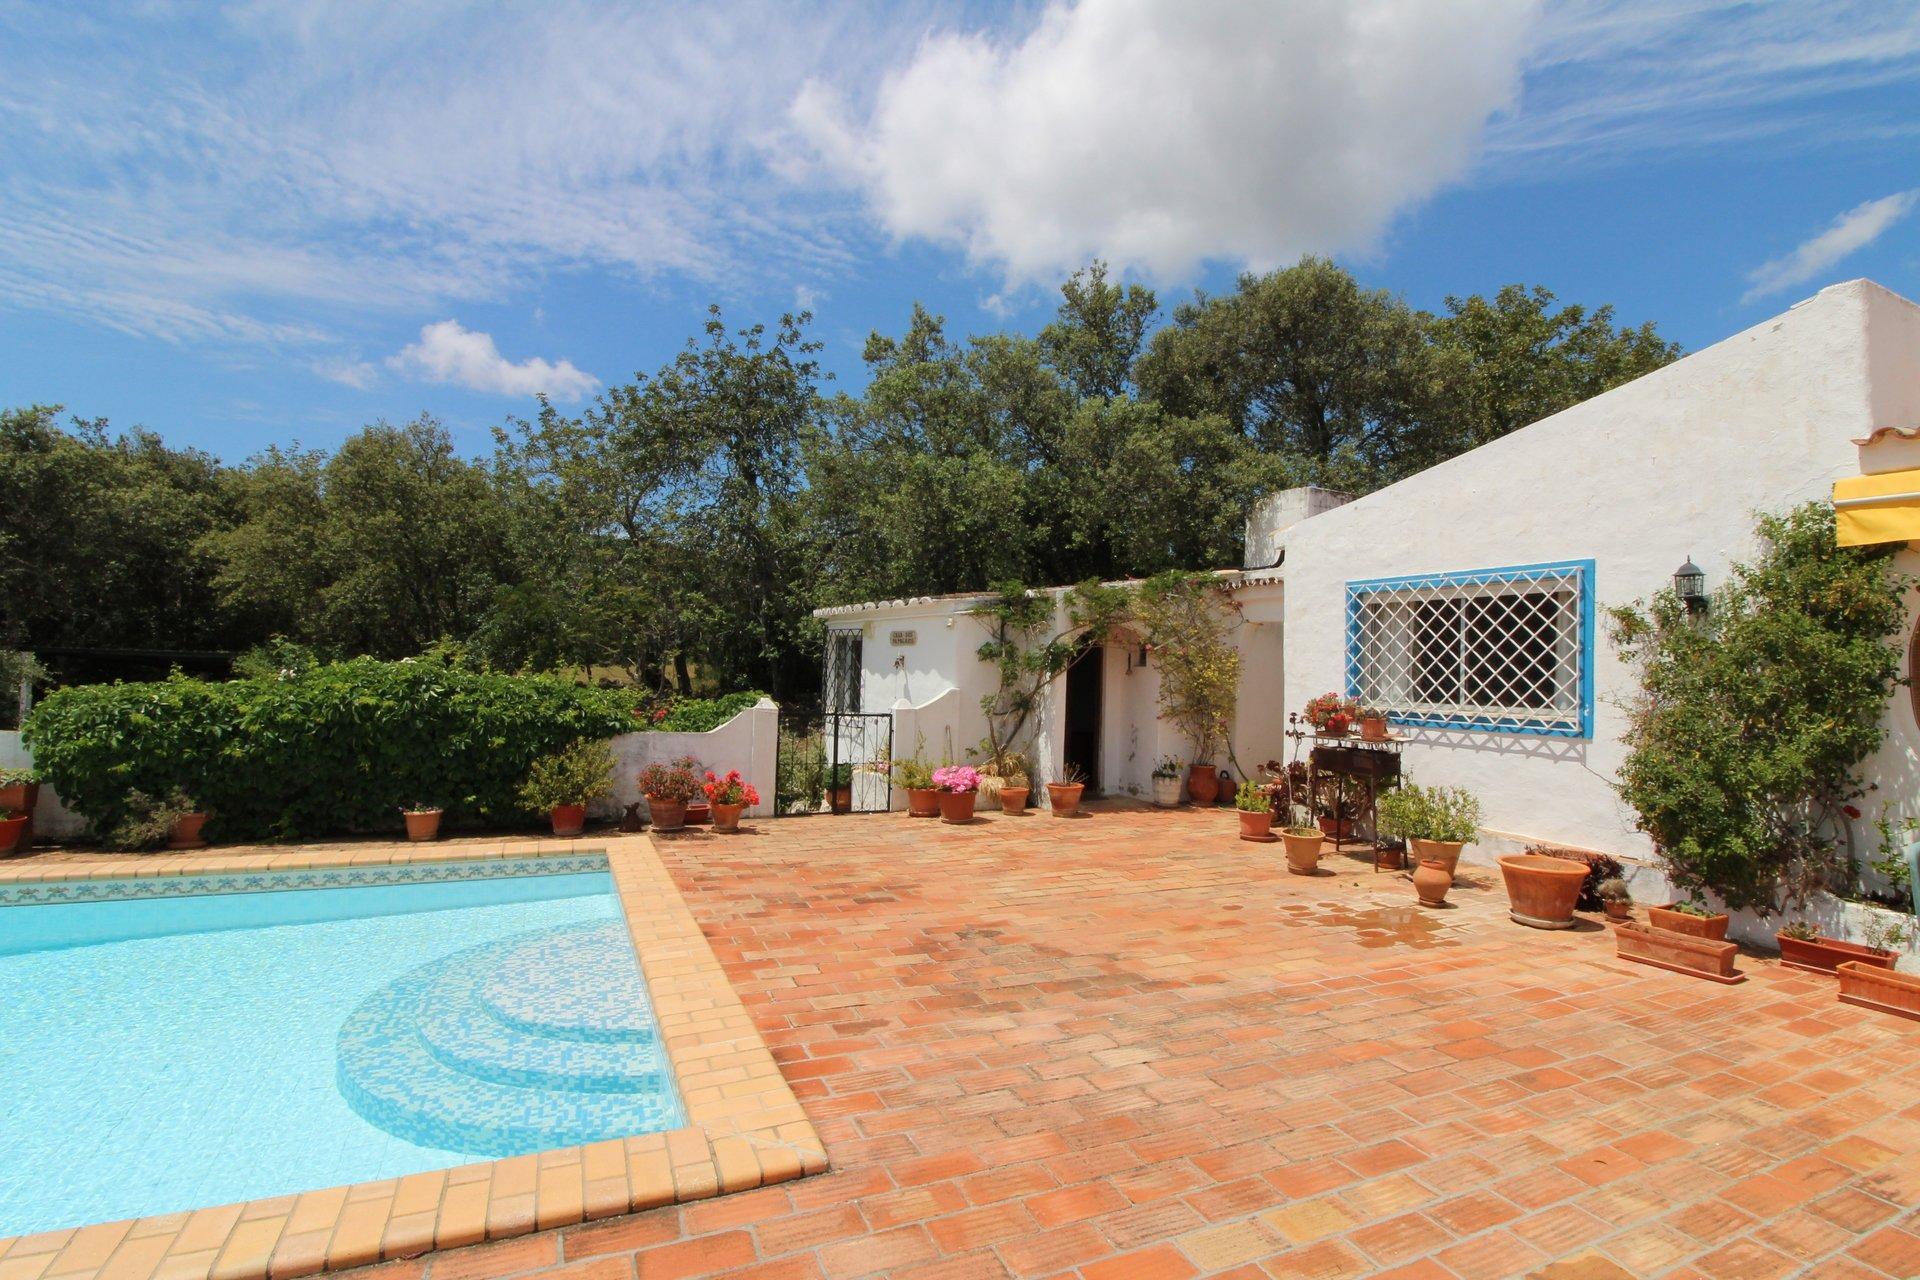 4 Bedroom Villa Santa Barbara de Nexe, Central Algarve Ref: MV20563